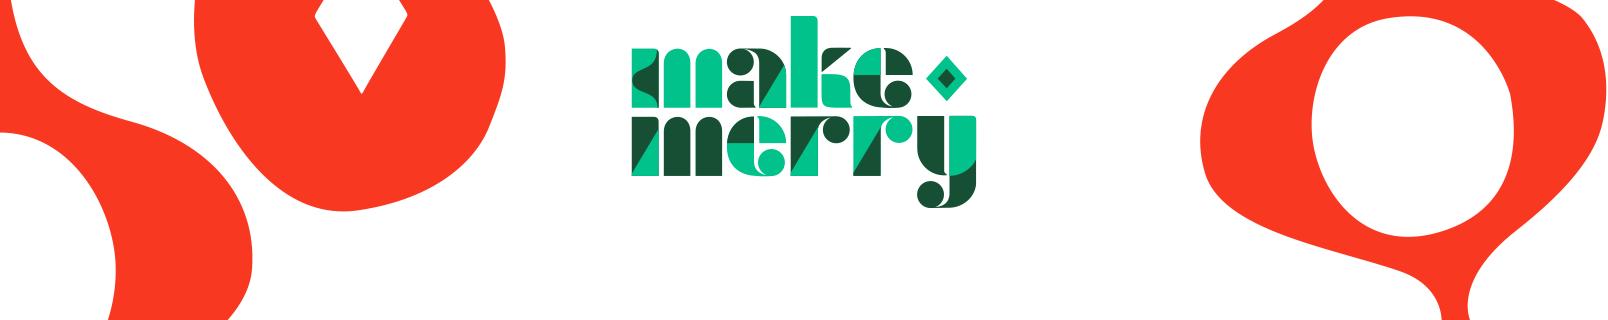 Make merry.